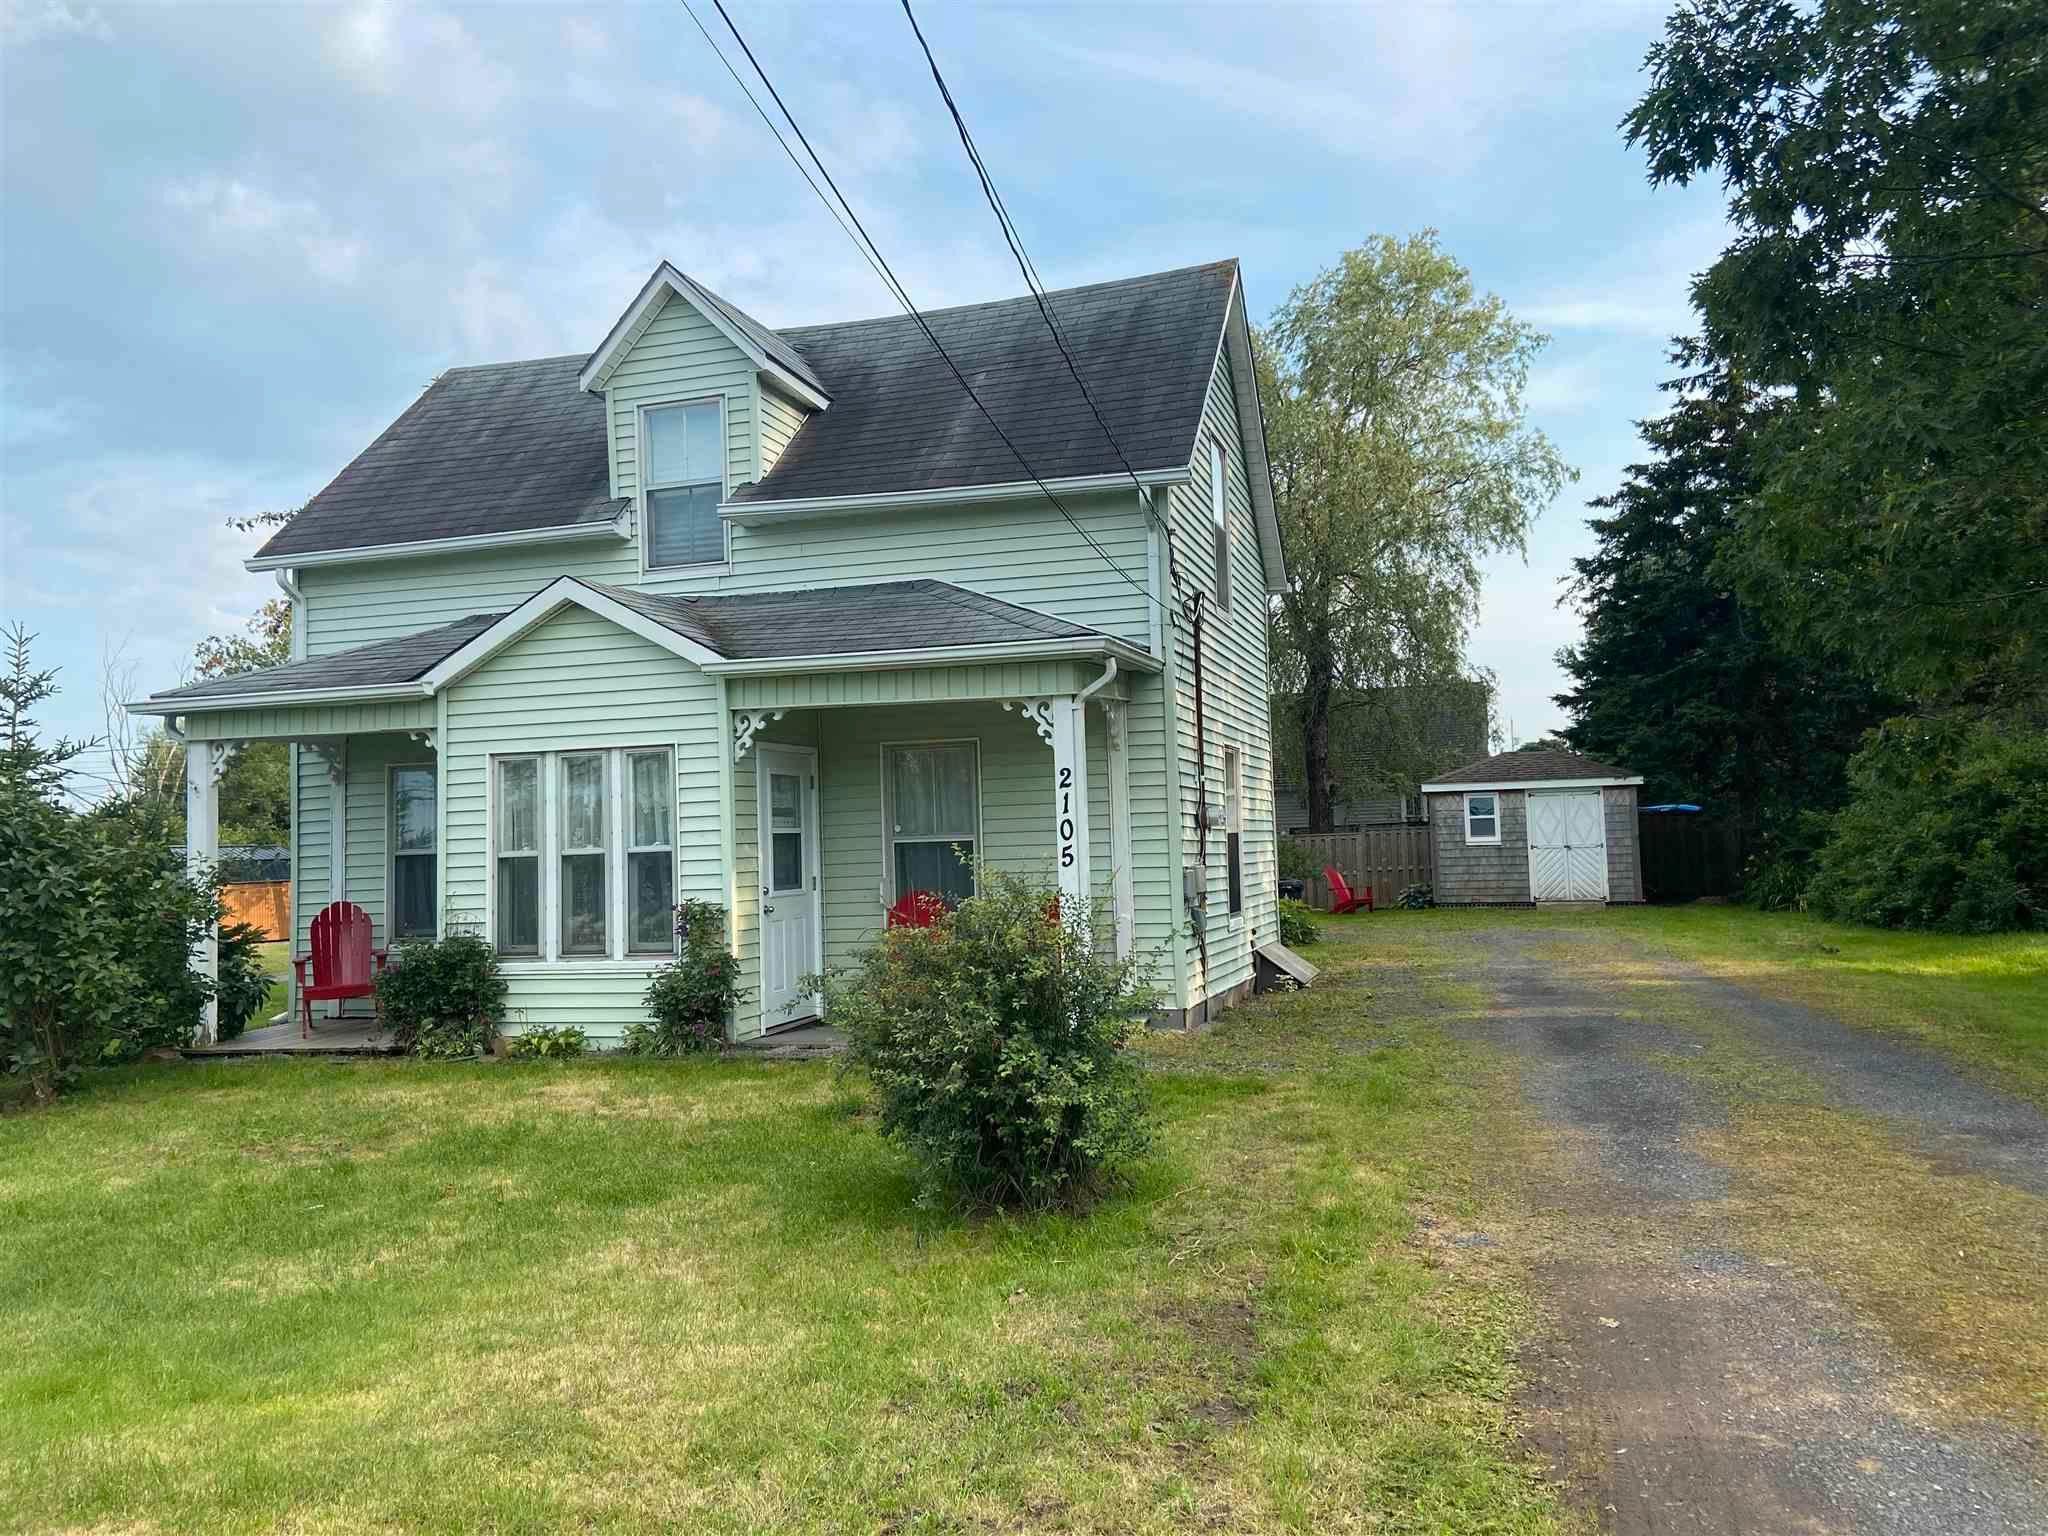 Main Photo: 2105 Cowan Street in Westville: 107-Trenton,Westville,Pictou Residential for sale (Northern Region)  : MLS®# 202120464